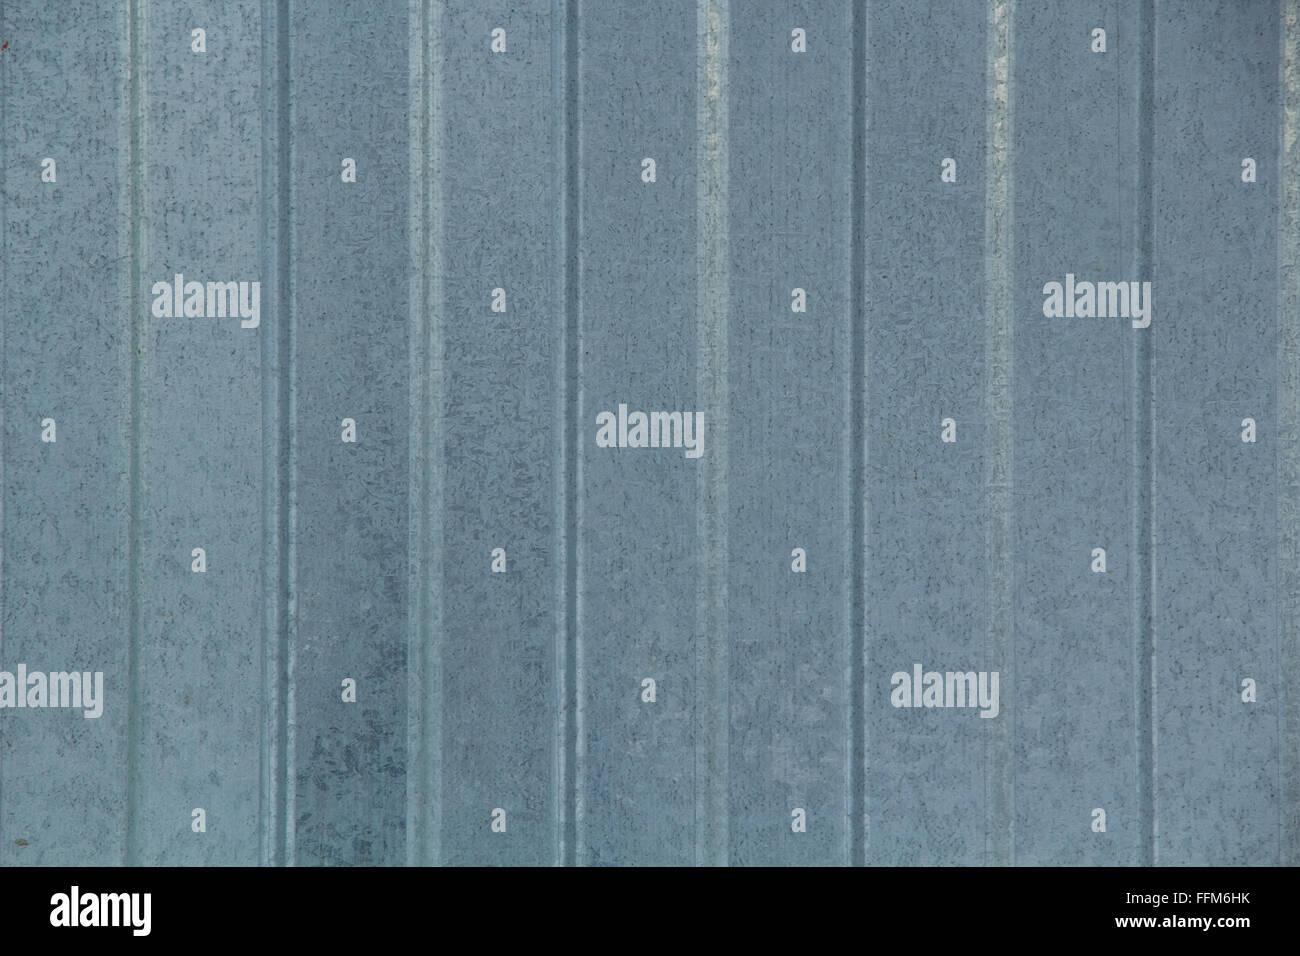 texture of galvanized sheet metal - Stock Image